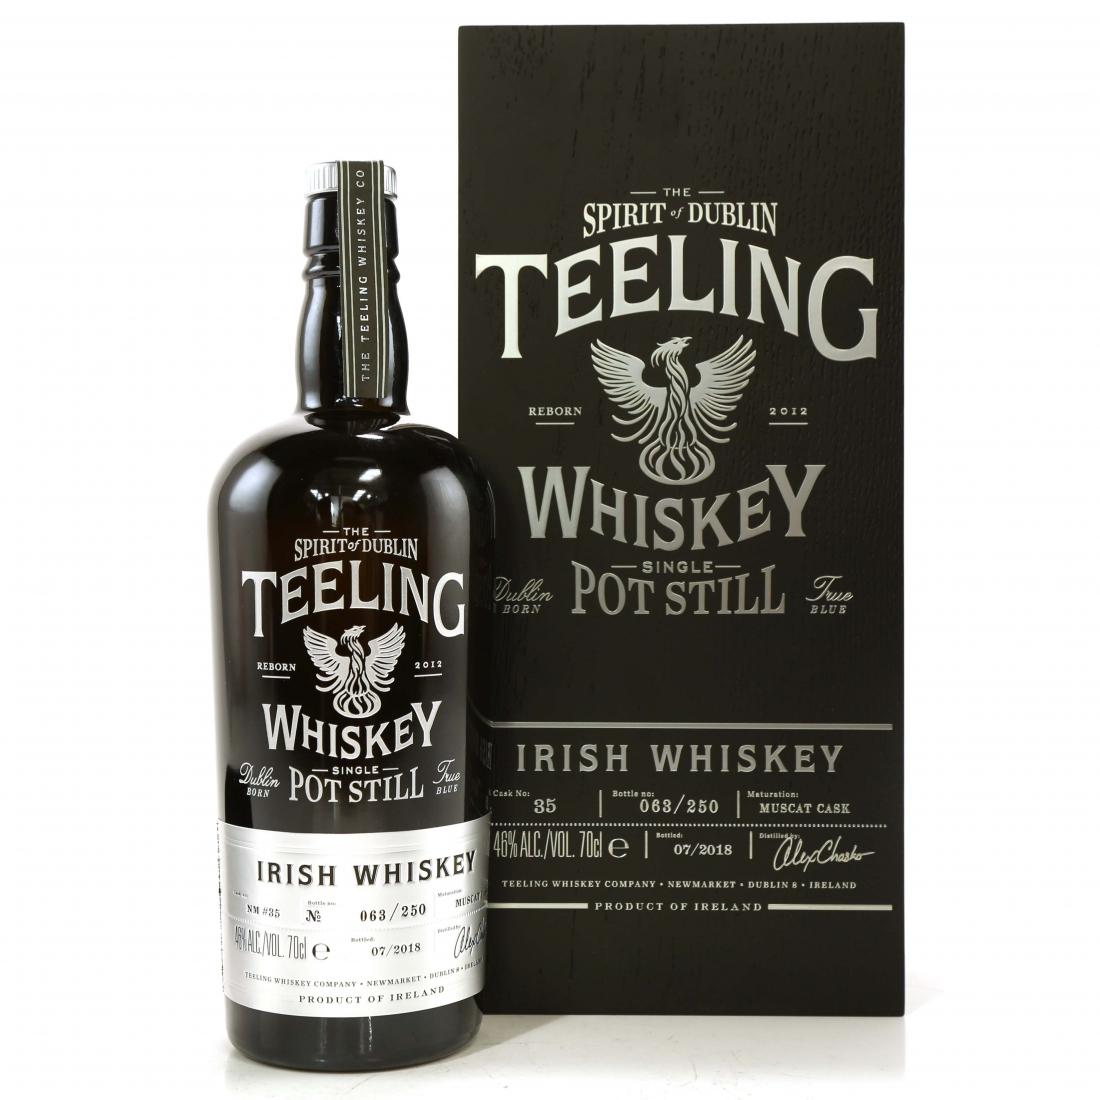 Teeling Celebratory Single Pot Still Whiskey / Bottle #063